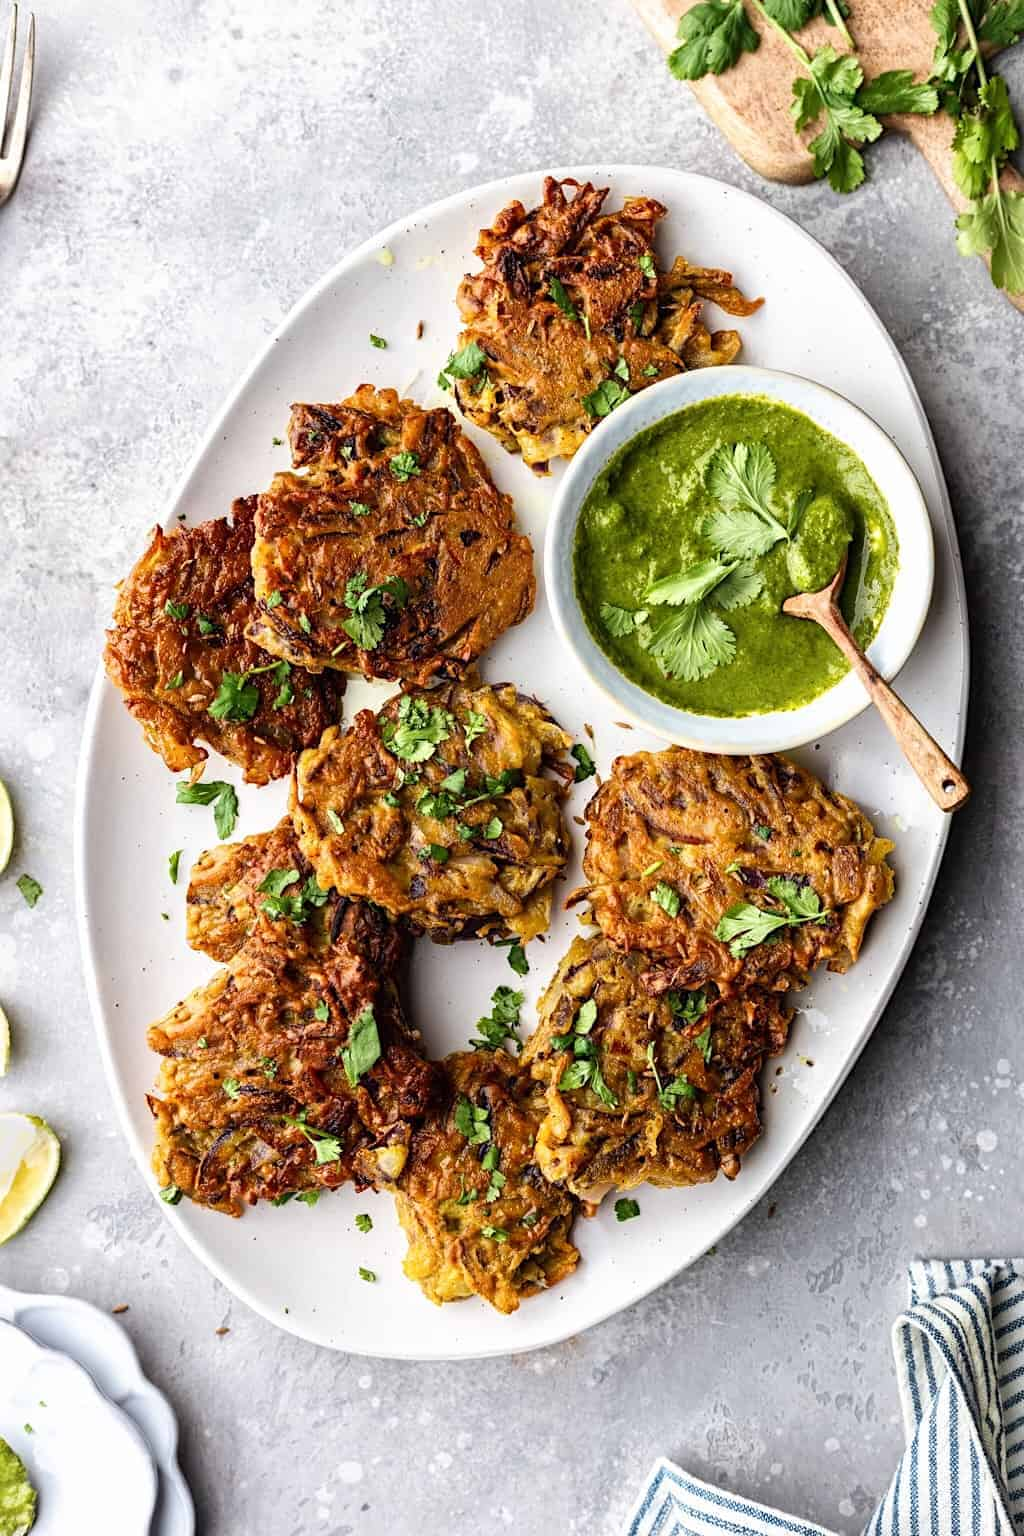 Easy Vegan Onion Bhajis with Coriander Dip #onion #bhaji #vegan #indianfood #glutenfree #curry